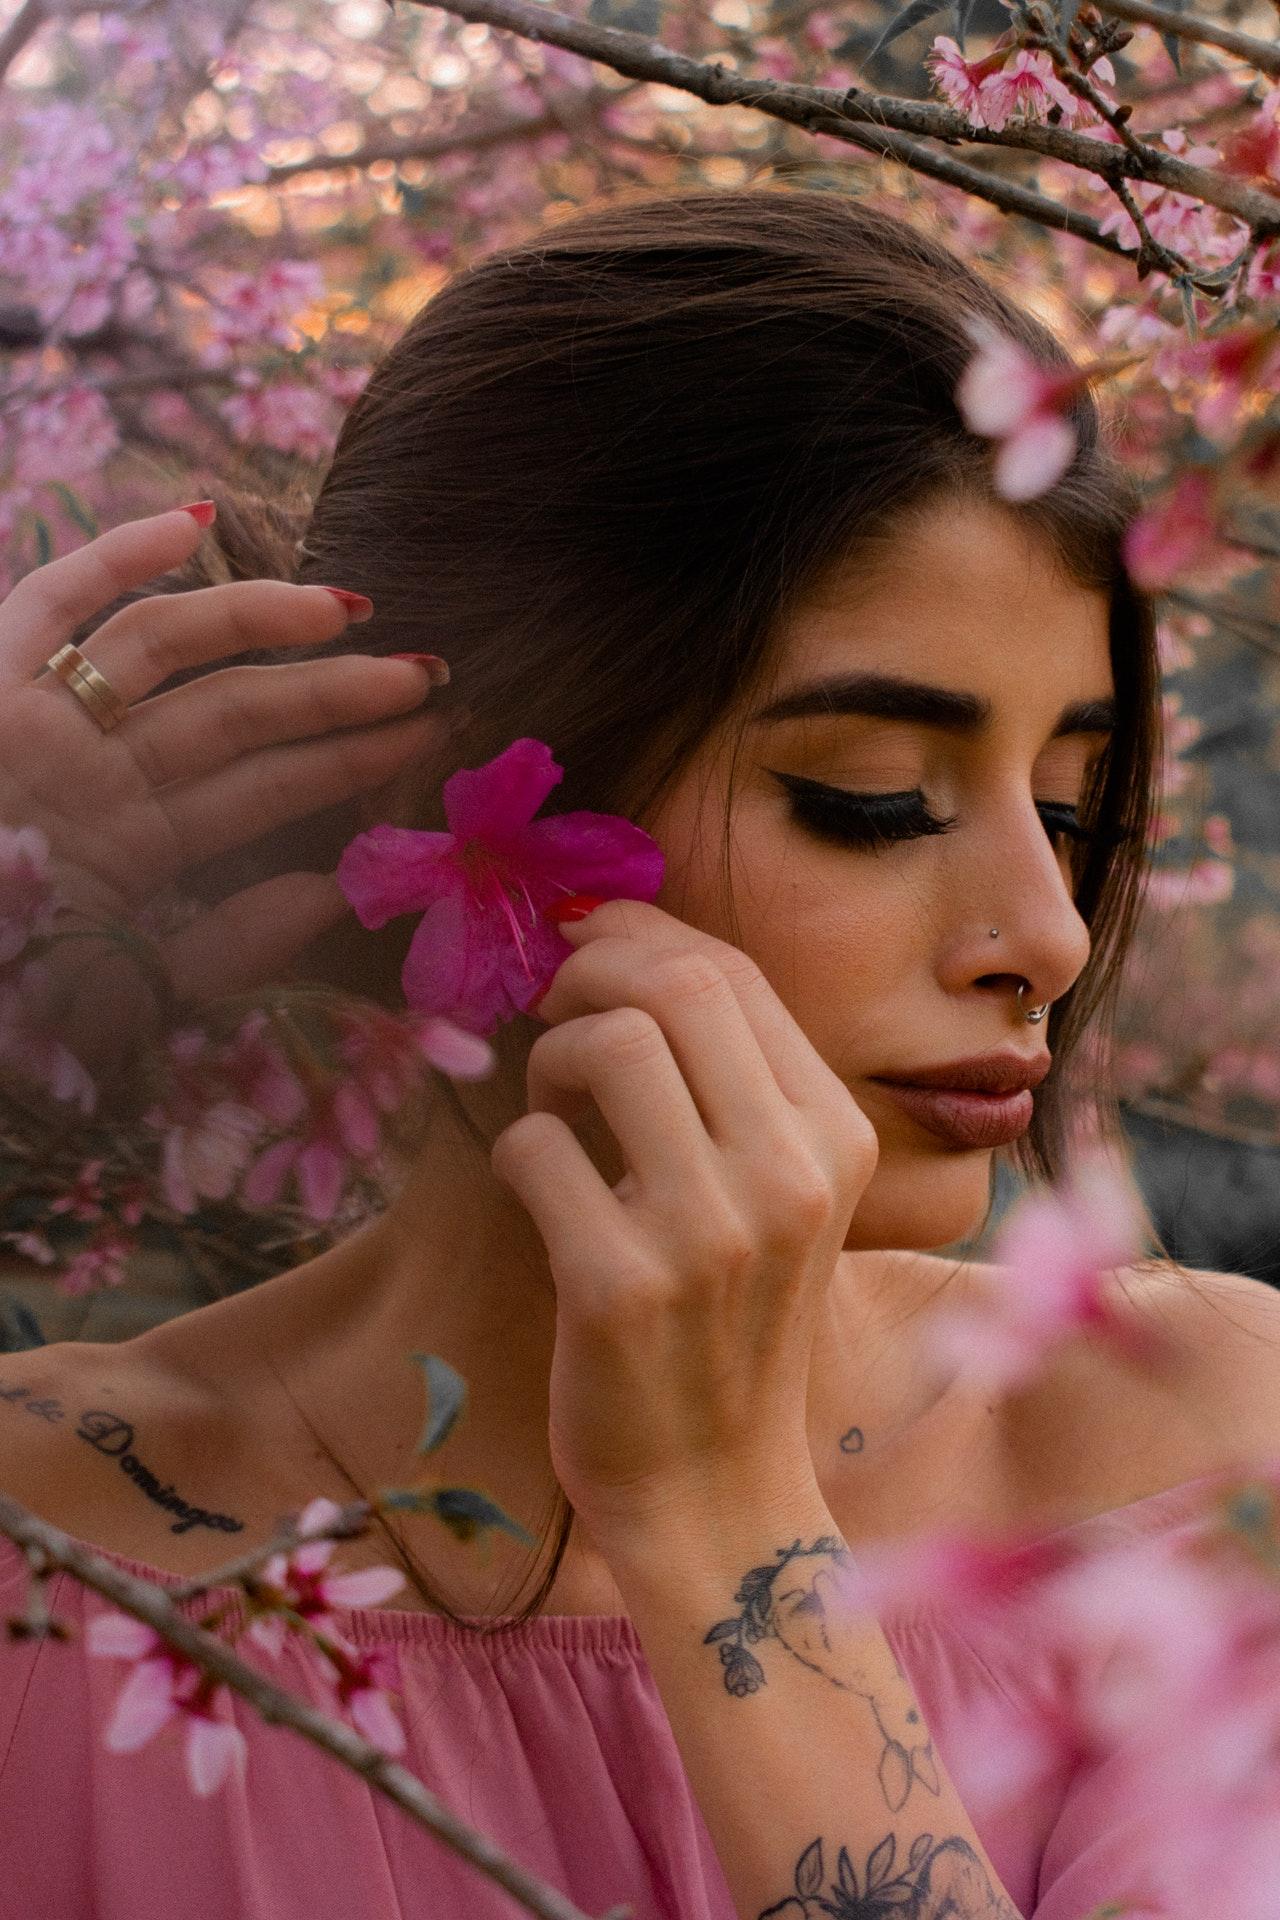 a focus photo of a Latina wearing shoulder-off pink shirt